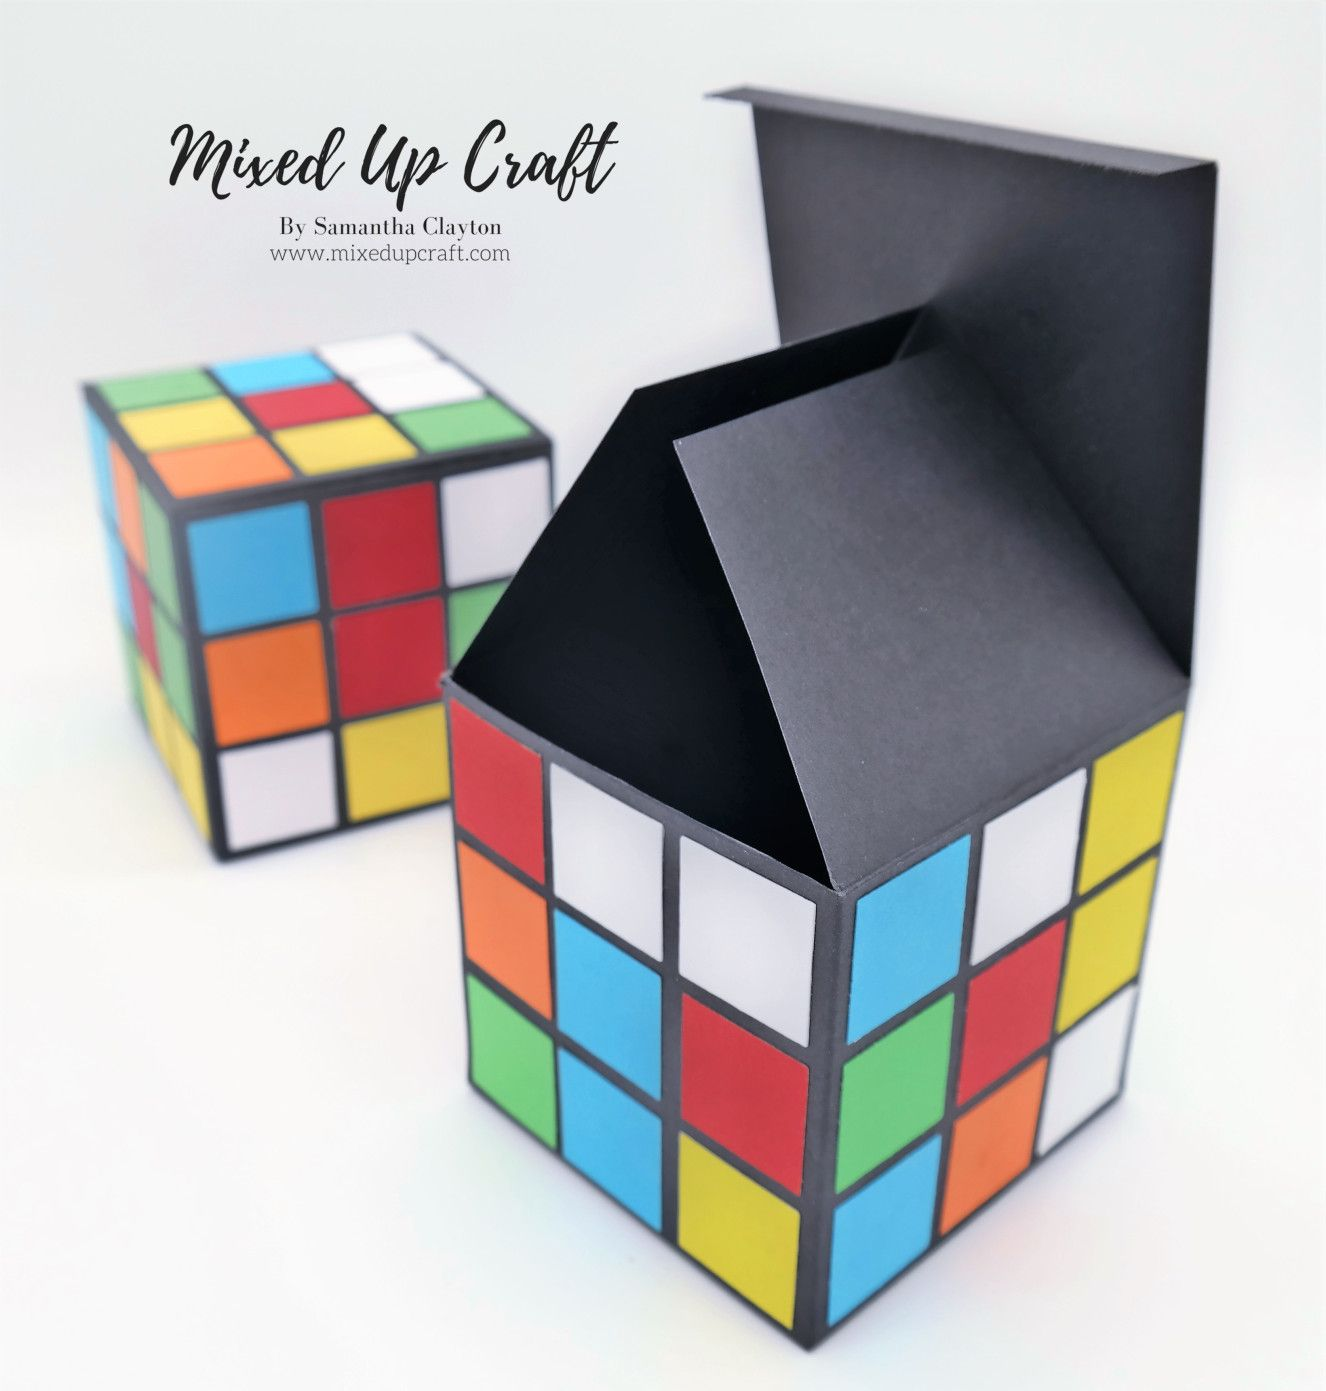 Rubik's Cube gift boxes